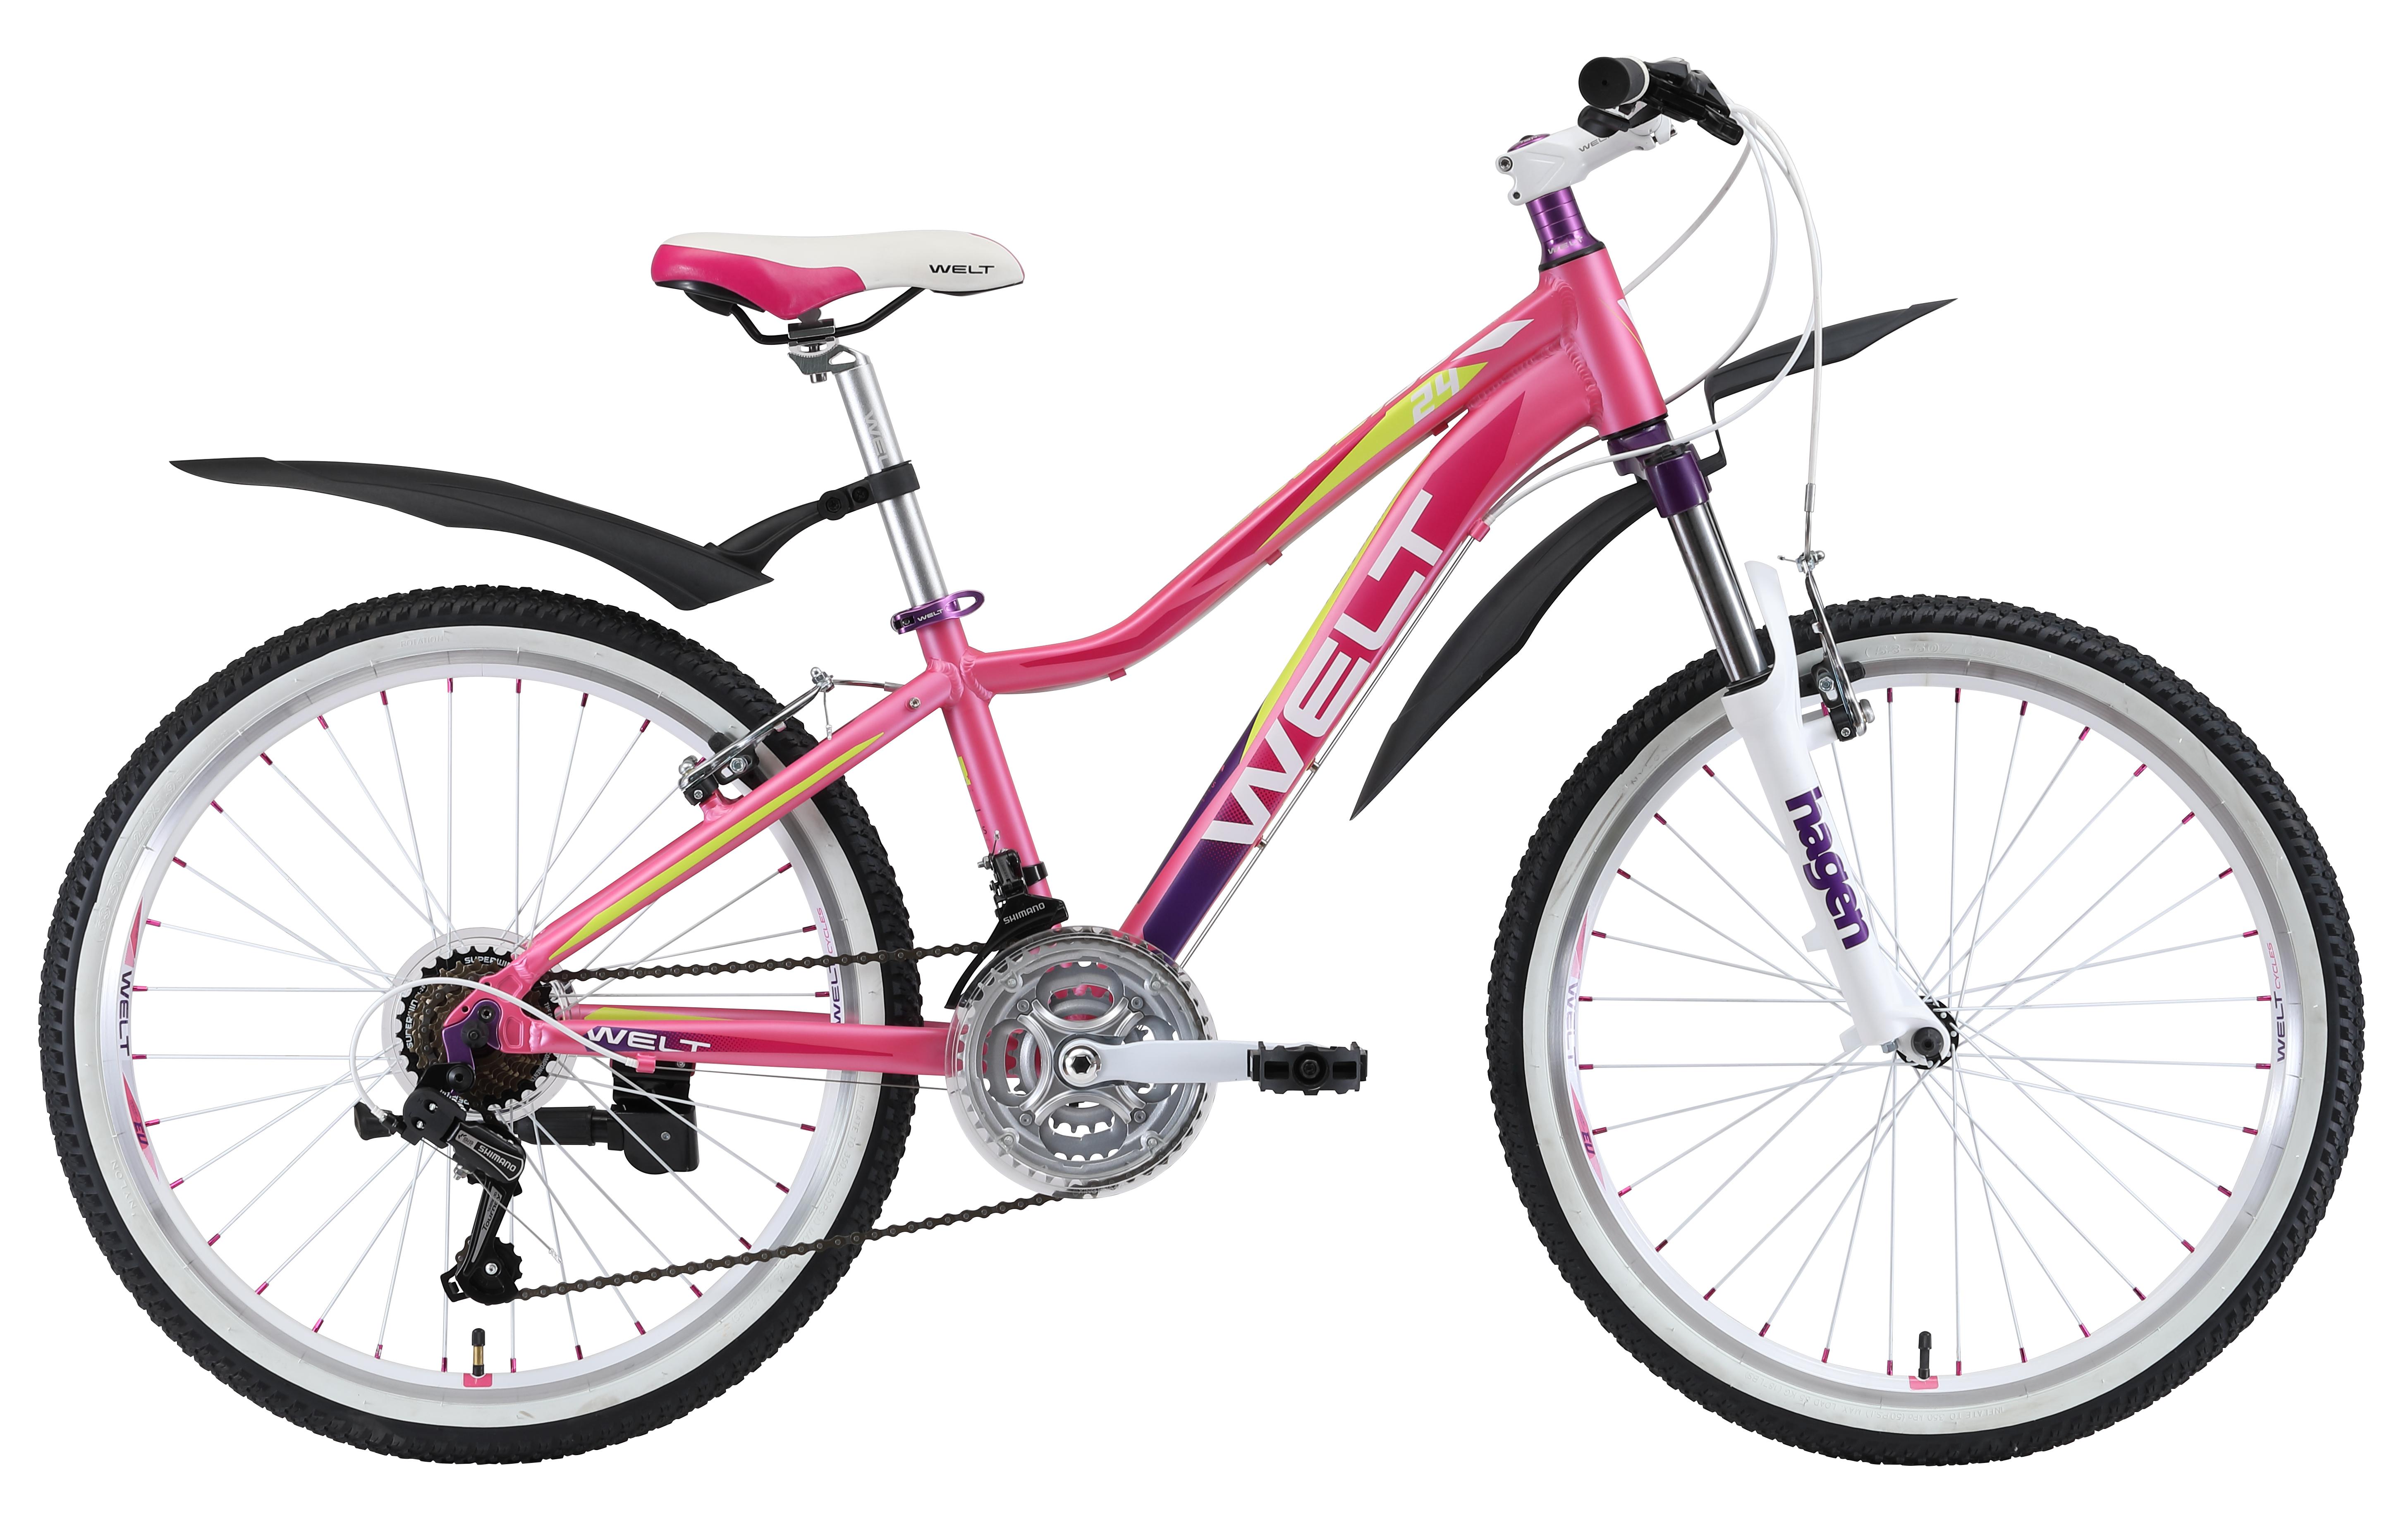 Велосипед Welt 2018 Edelweiss 24 white/red/orange, Велосипеды - арт. 1029190390